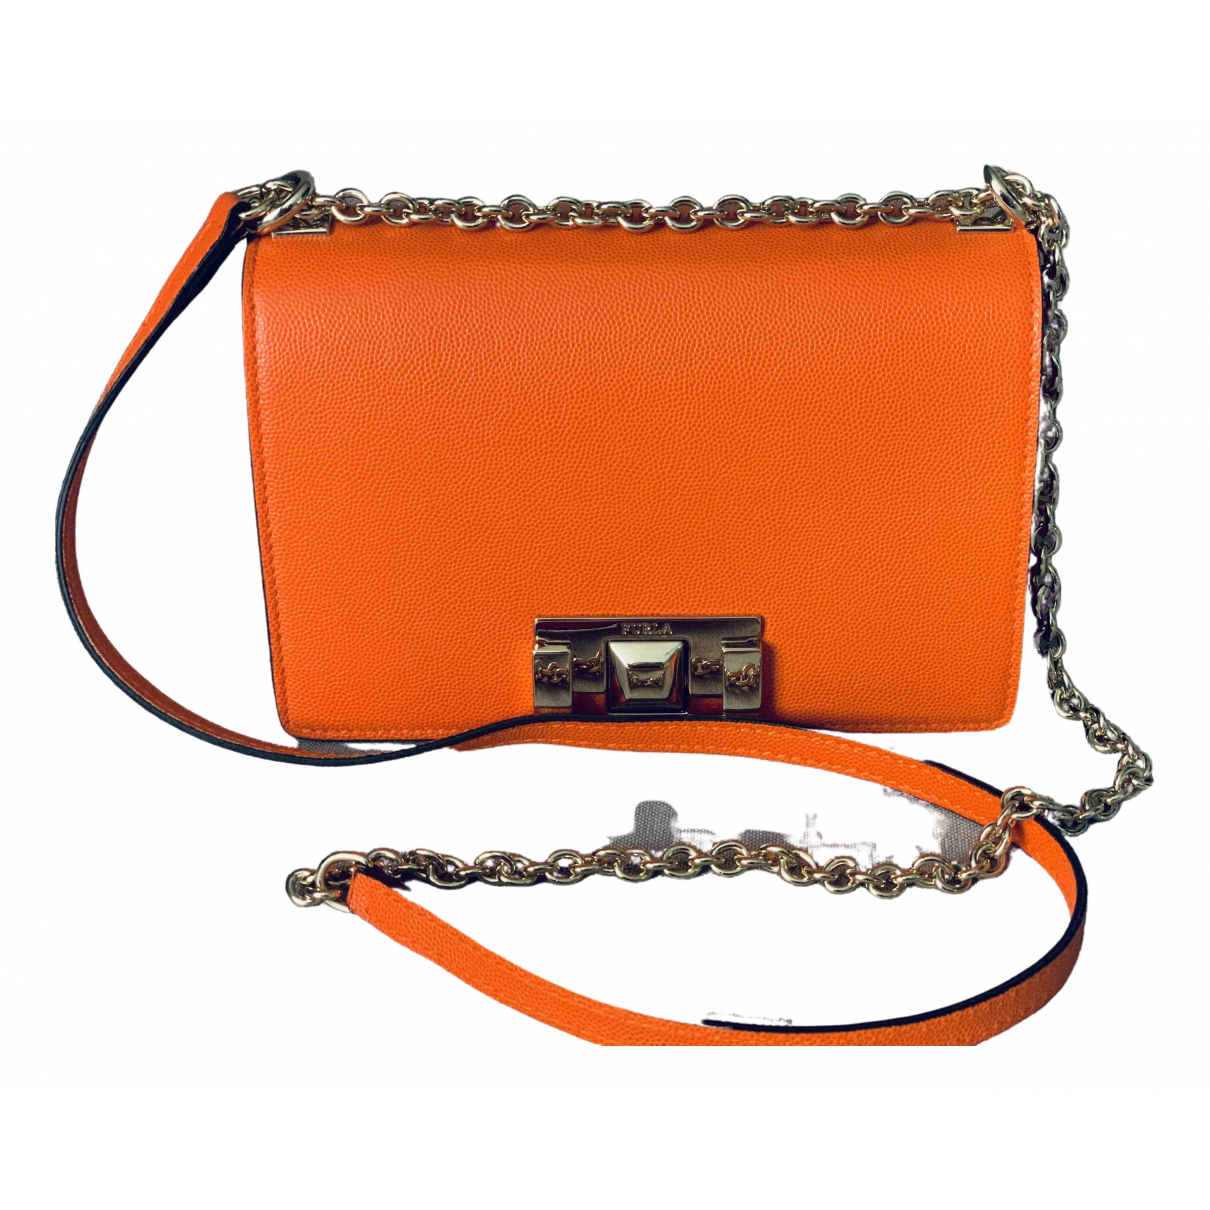 Furla \N Orange Leather handbag for Women \N